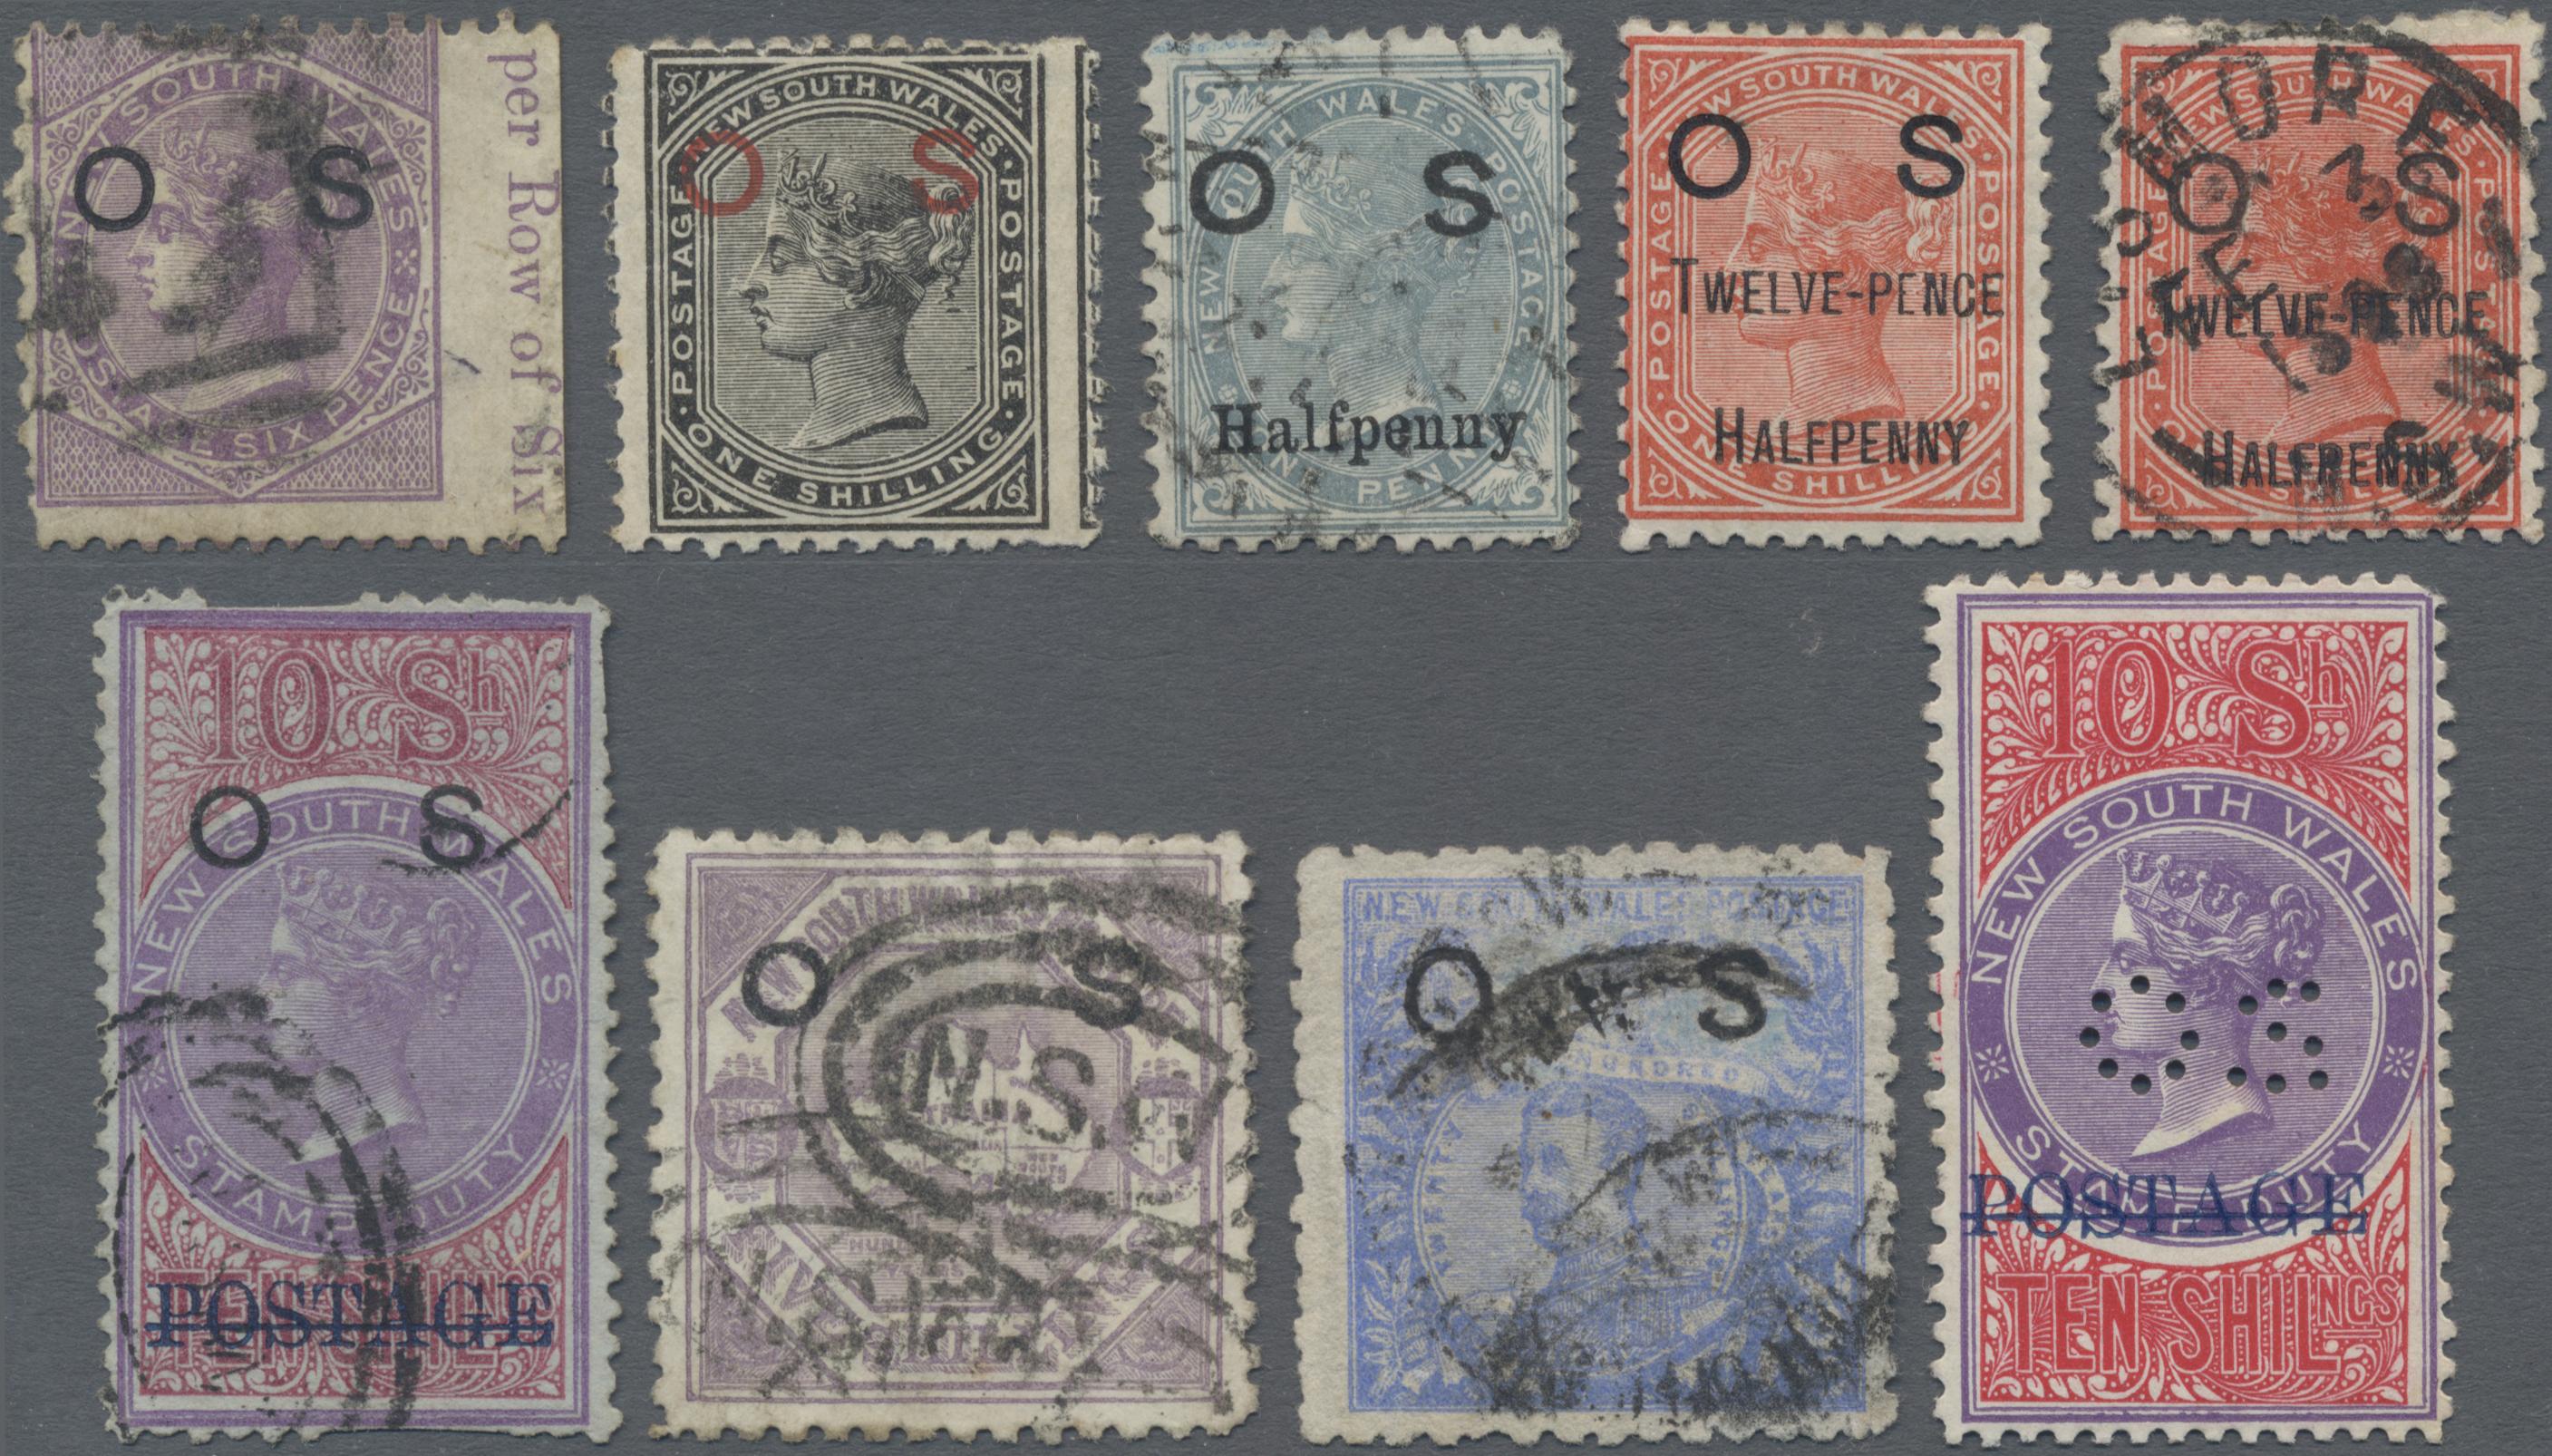 Lot 16069 - Neusüdwales - Dienstmarken  -  Auktionshaus Christoph Gärtner GmbH & Co. KG 50th Auction Anniversary Auction - Day 5